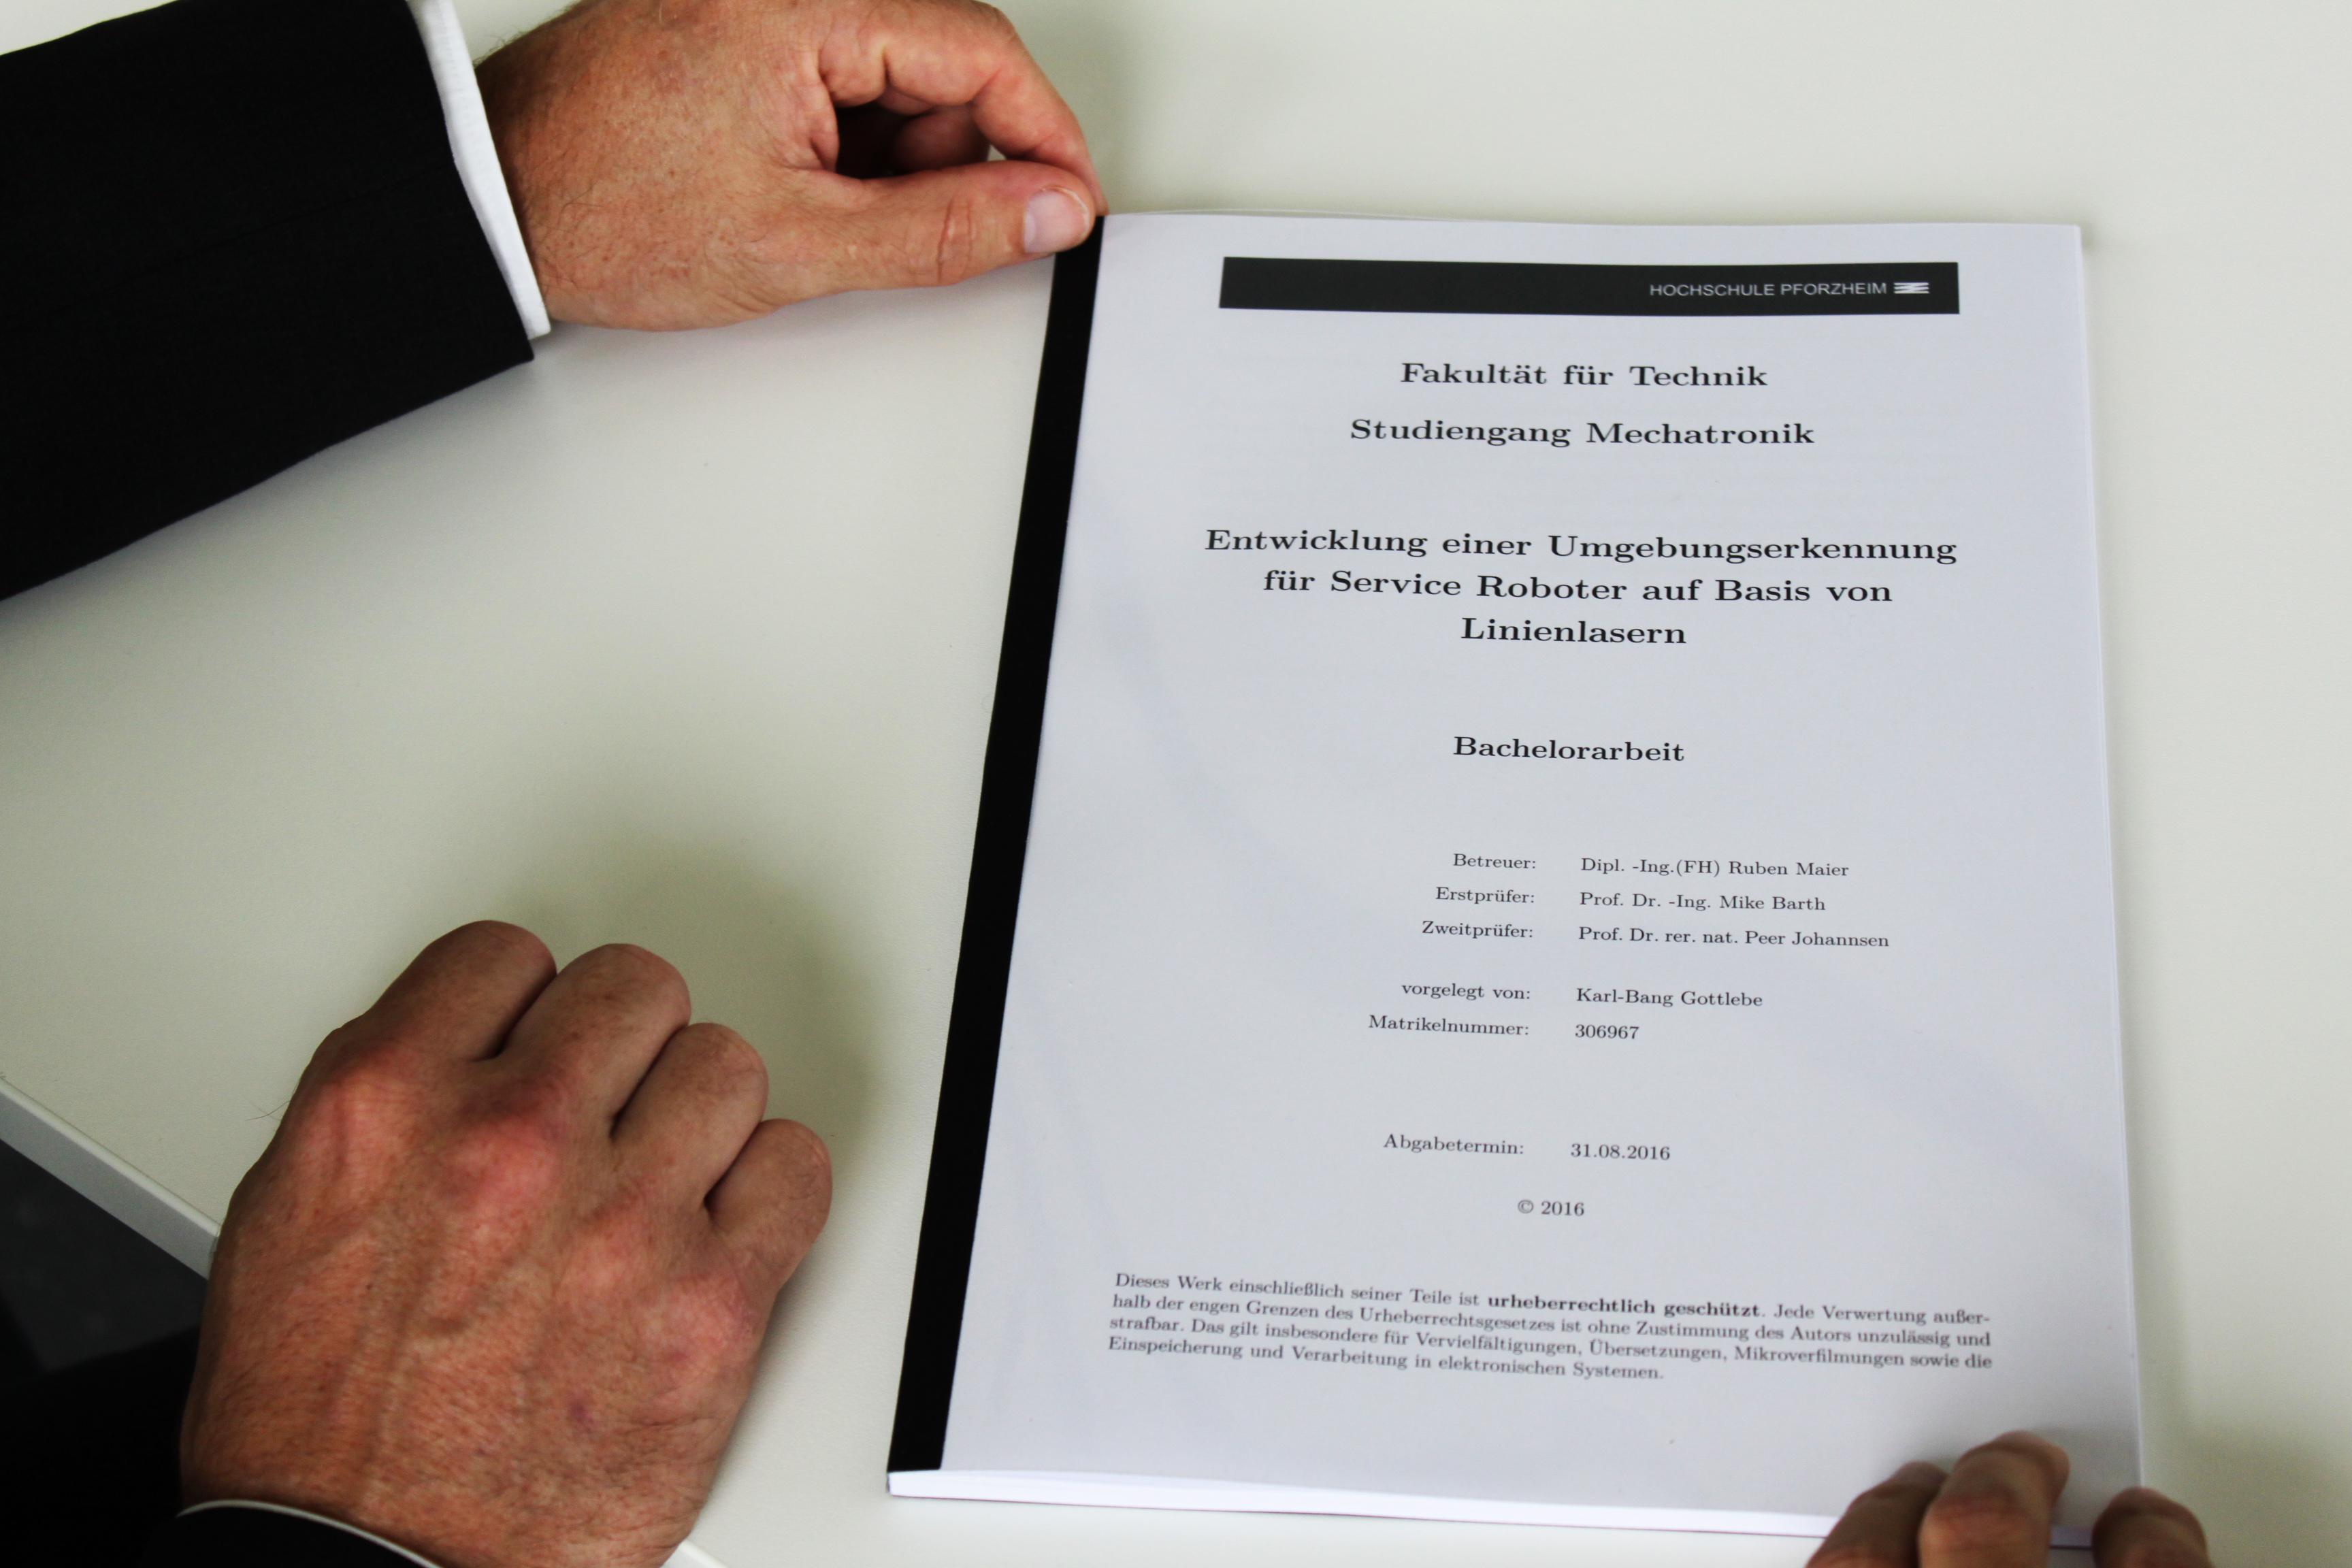 hochschule pforzheim bachelor thesis